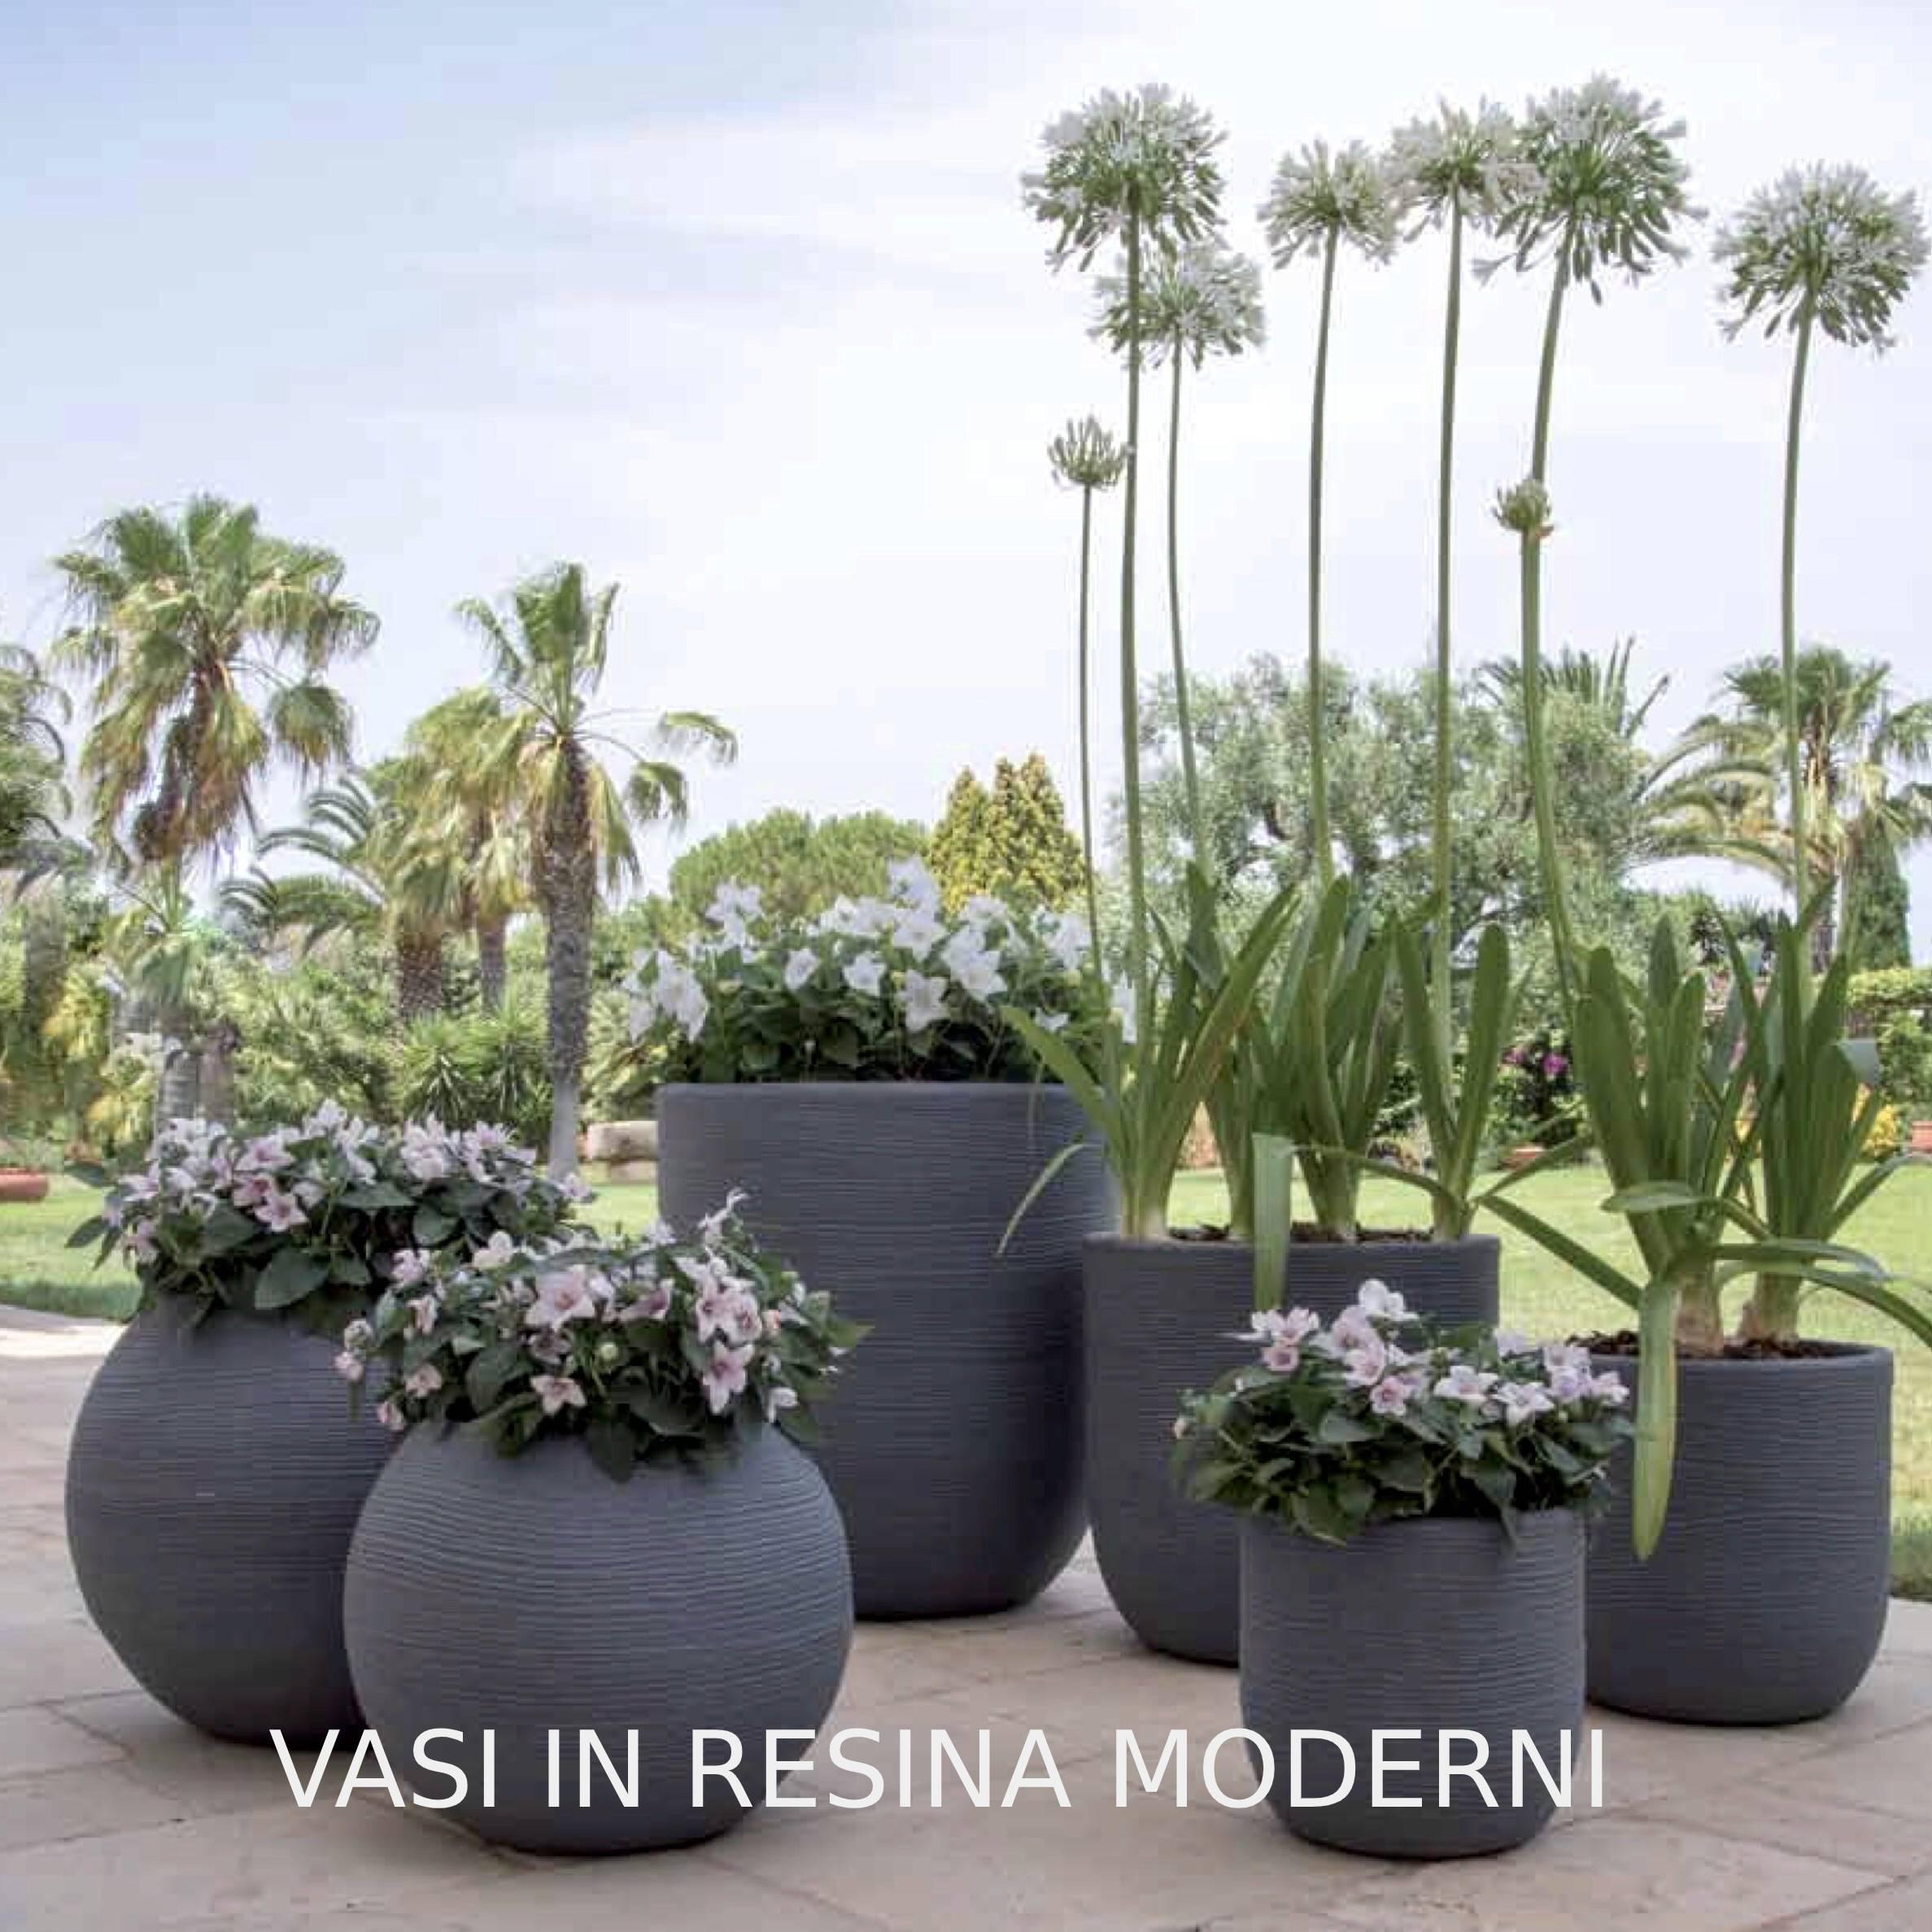 Vasi Per Piante Da Terrazzo green più vendita online vasi, fioriera in resina vasar